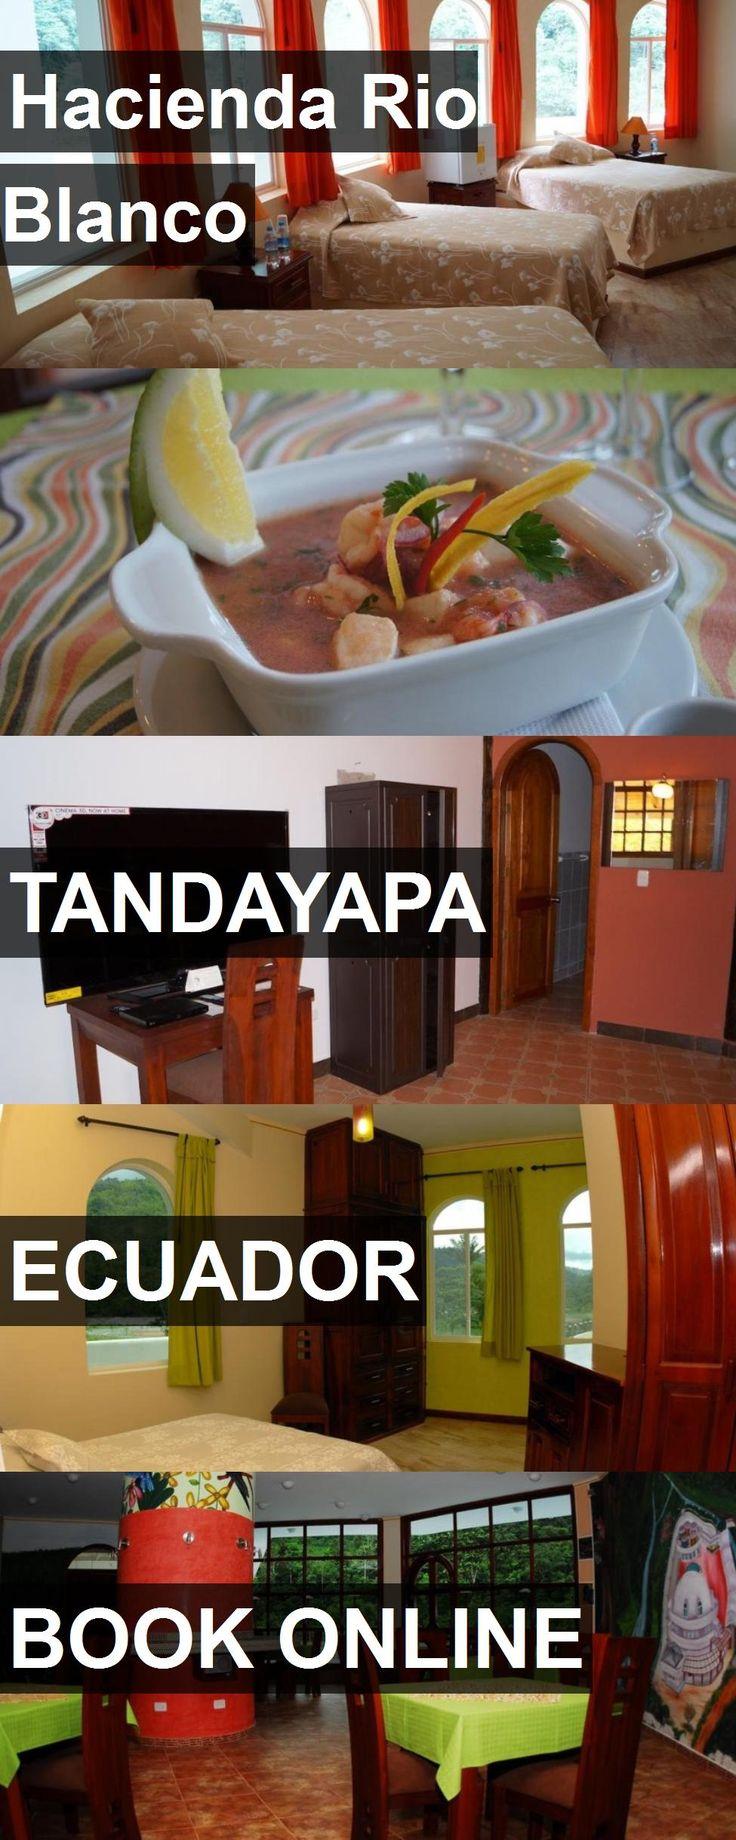 Hotel Hacienda Rio Blanco in Tandayapa, Ecuador. For more information, photos, reviews and best prices please follow the link. #Ecuador #Tandayapa #travel #vacation #hotel